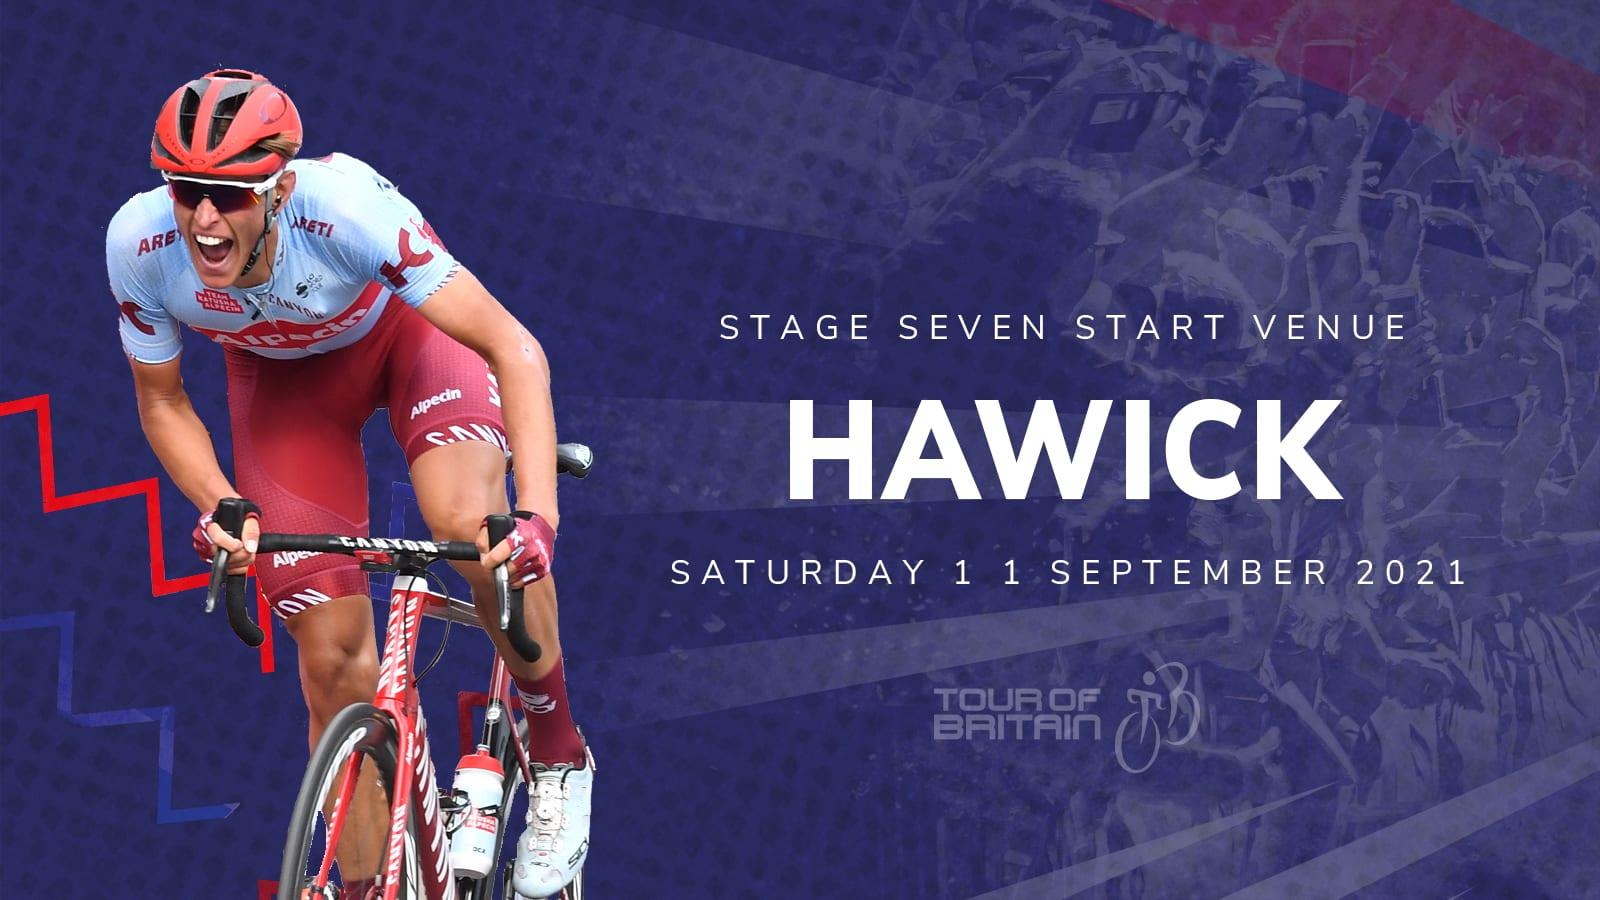 Tour of Britain Scottish Borders Hawick